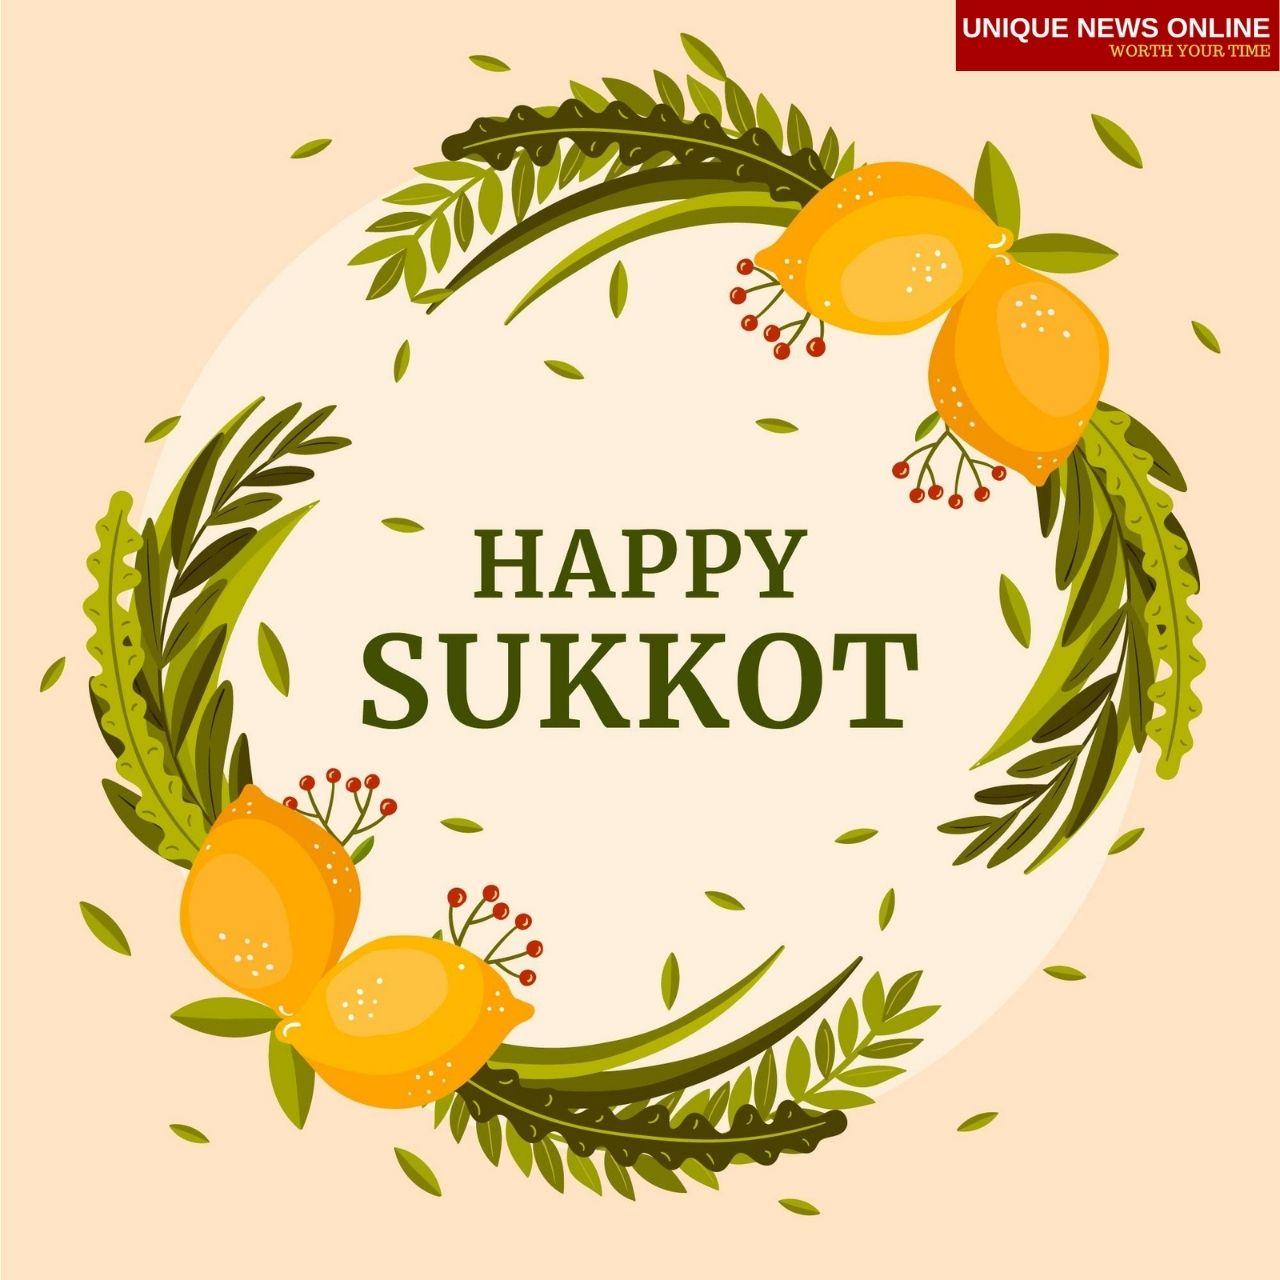 Happy Sukkot